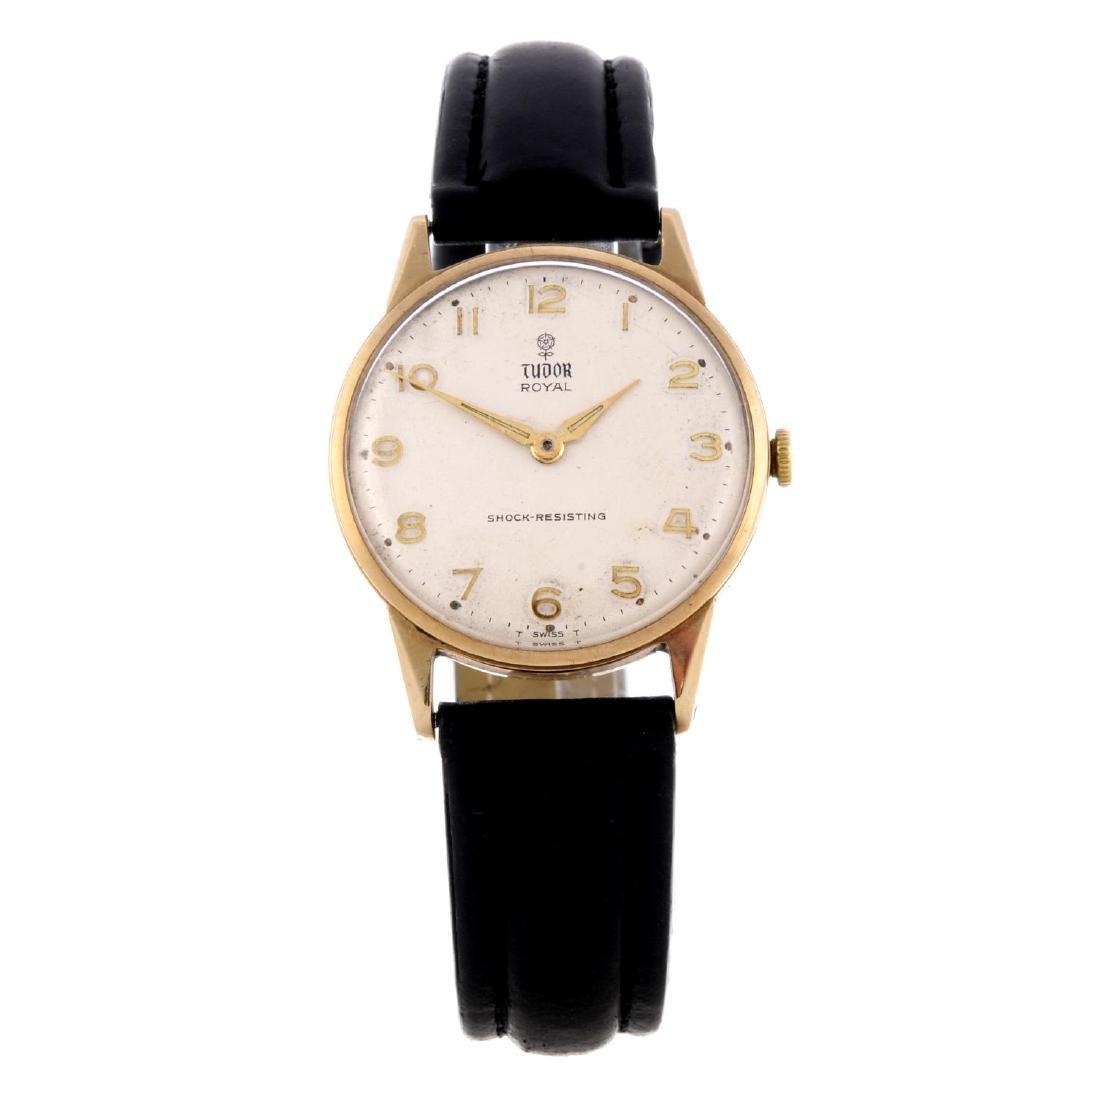 TUDOR - a gentleman's Royal wrist watch. Yellow metal